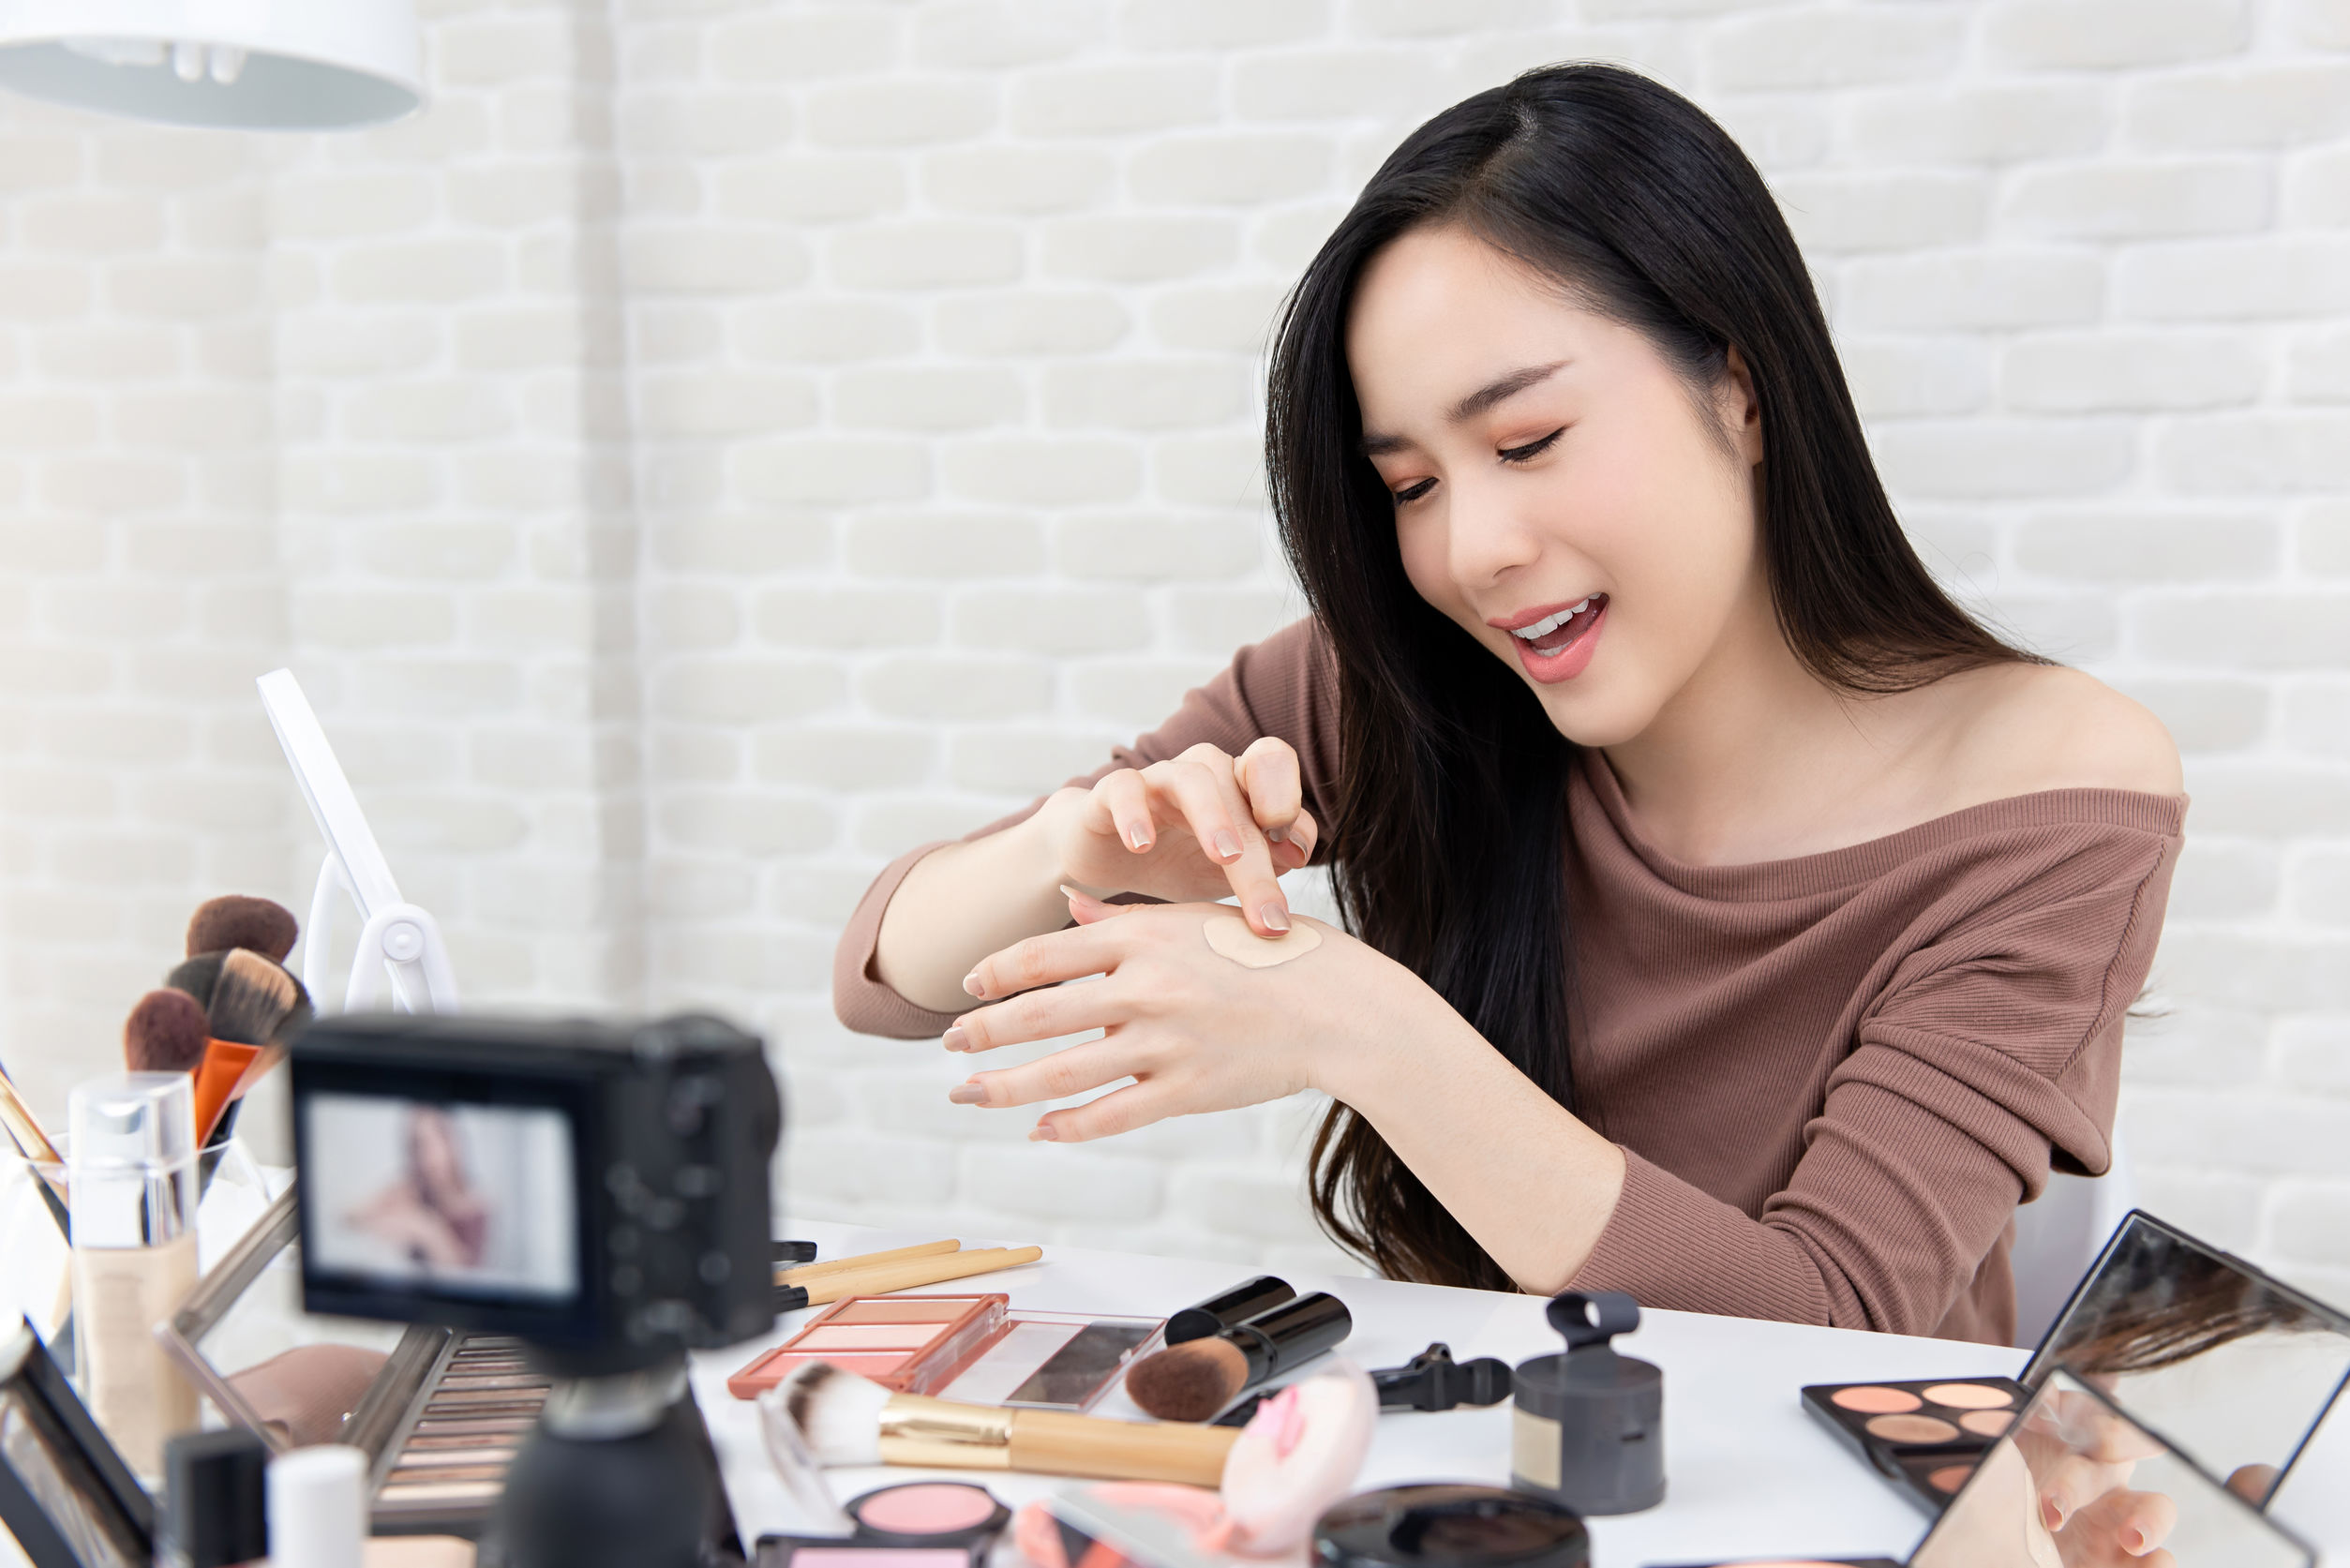 Mujer asiática aplicando maquillaje